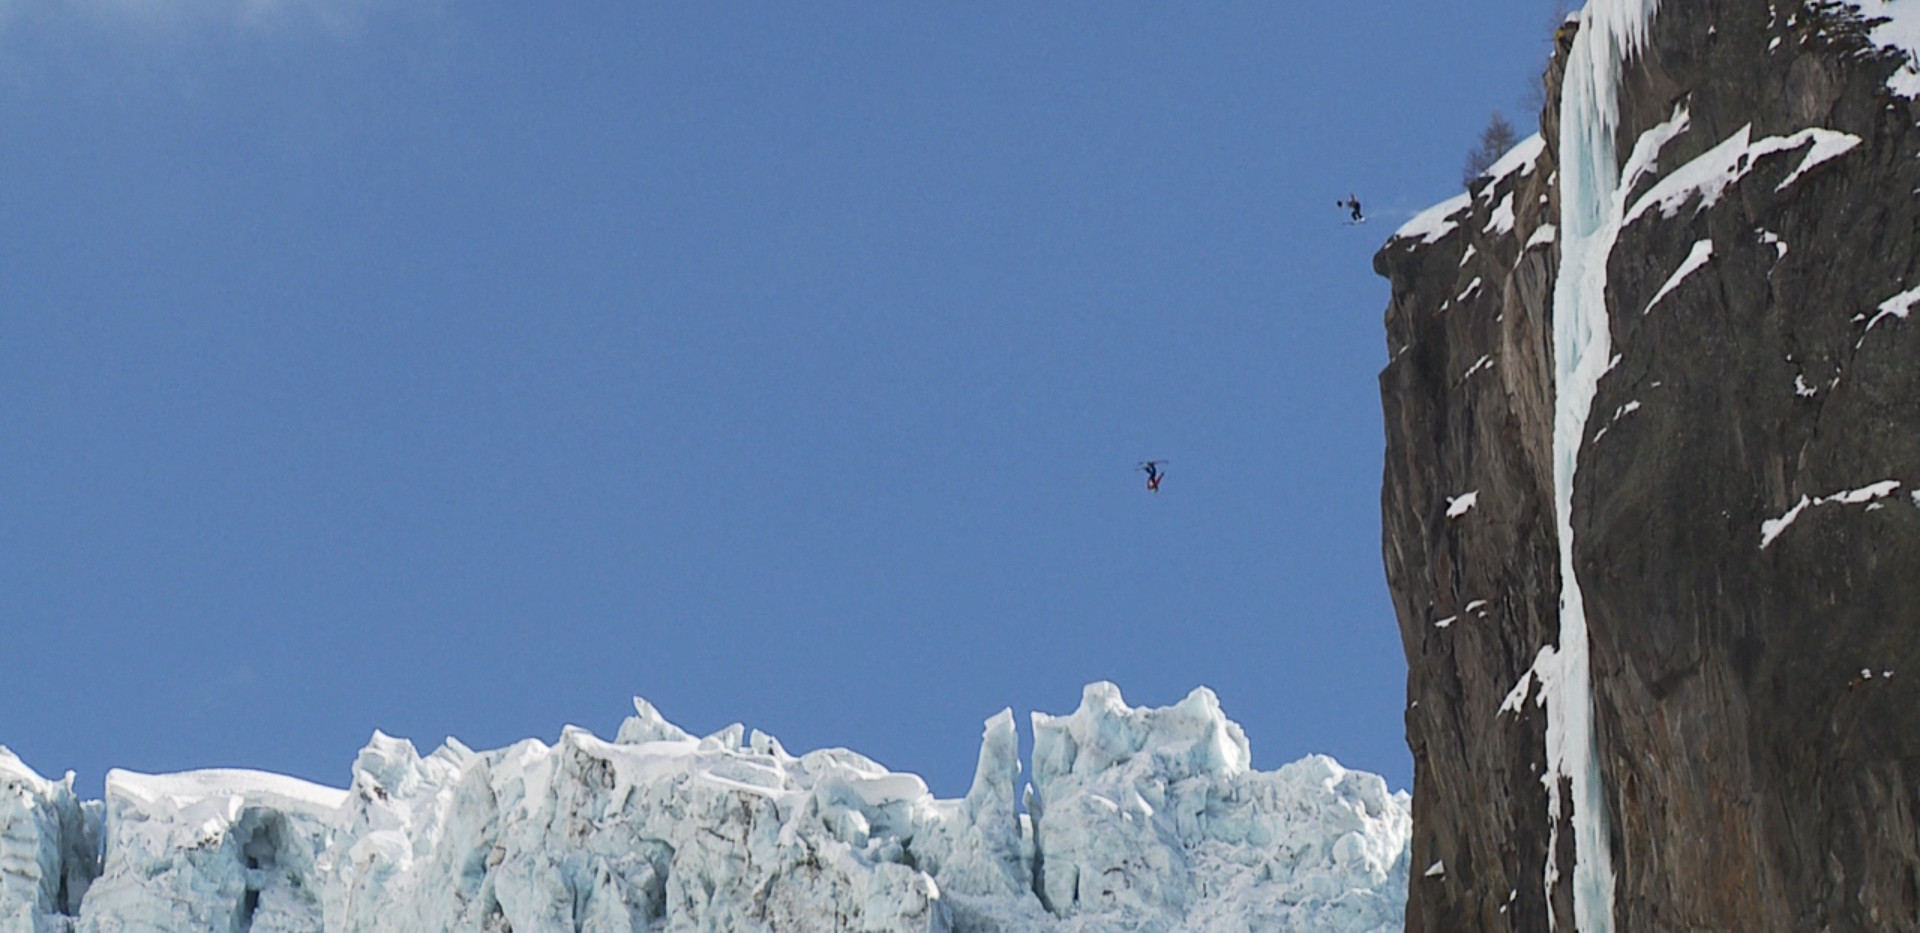 Ski-BASE Jump Double